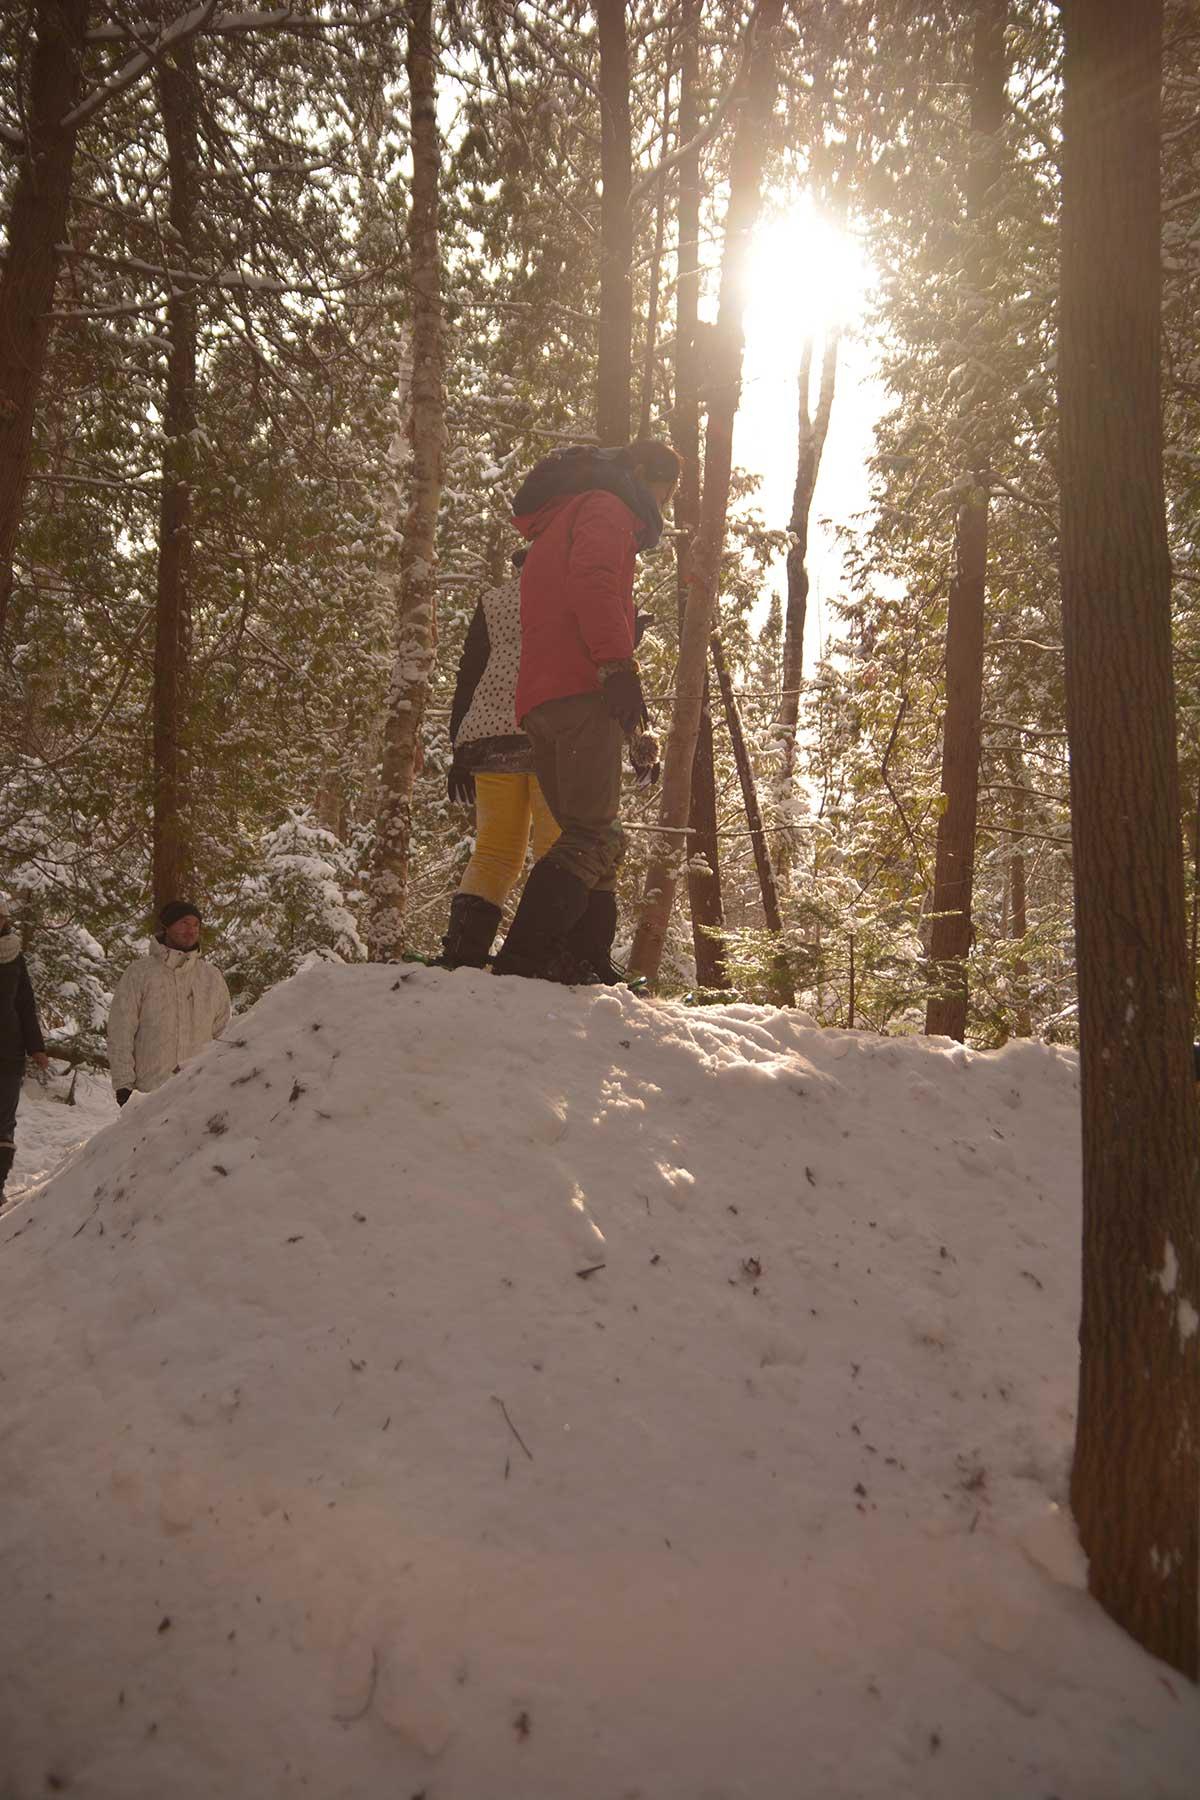 Winter-Camping-Feb-17-19,-2015-118.jpg